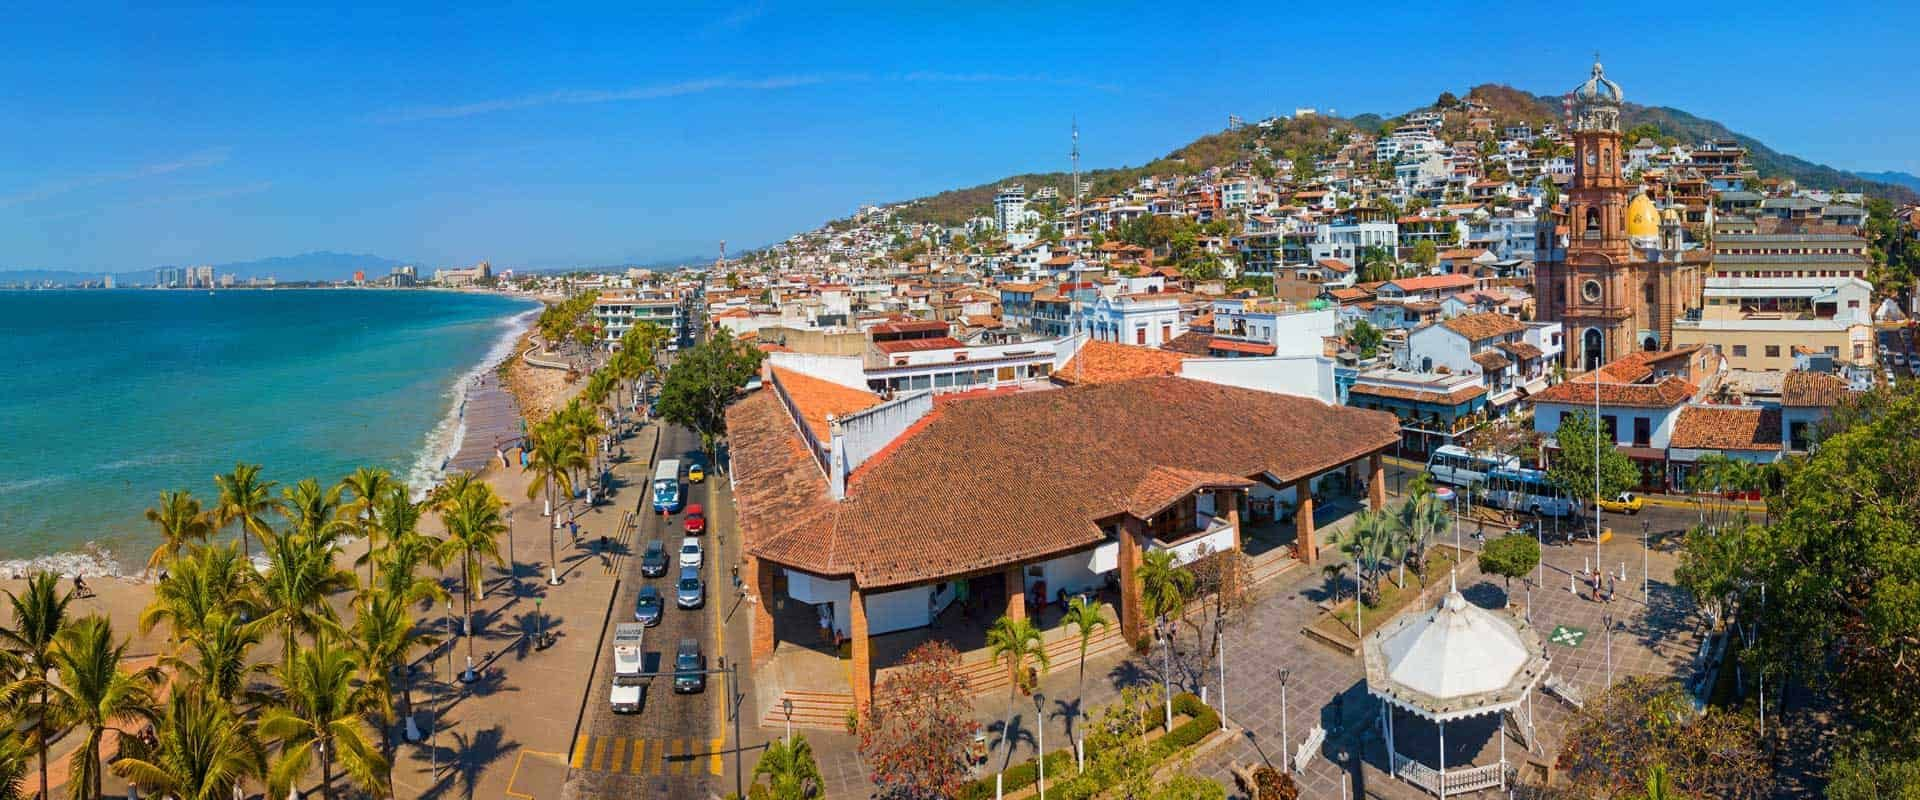 AMPI – Asociación Mexicana de Profesionales Inmobiliarios